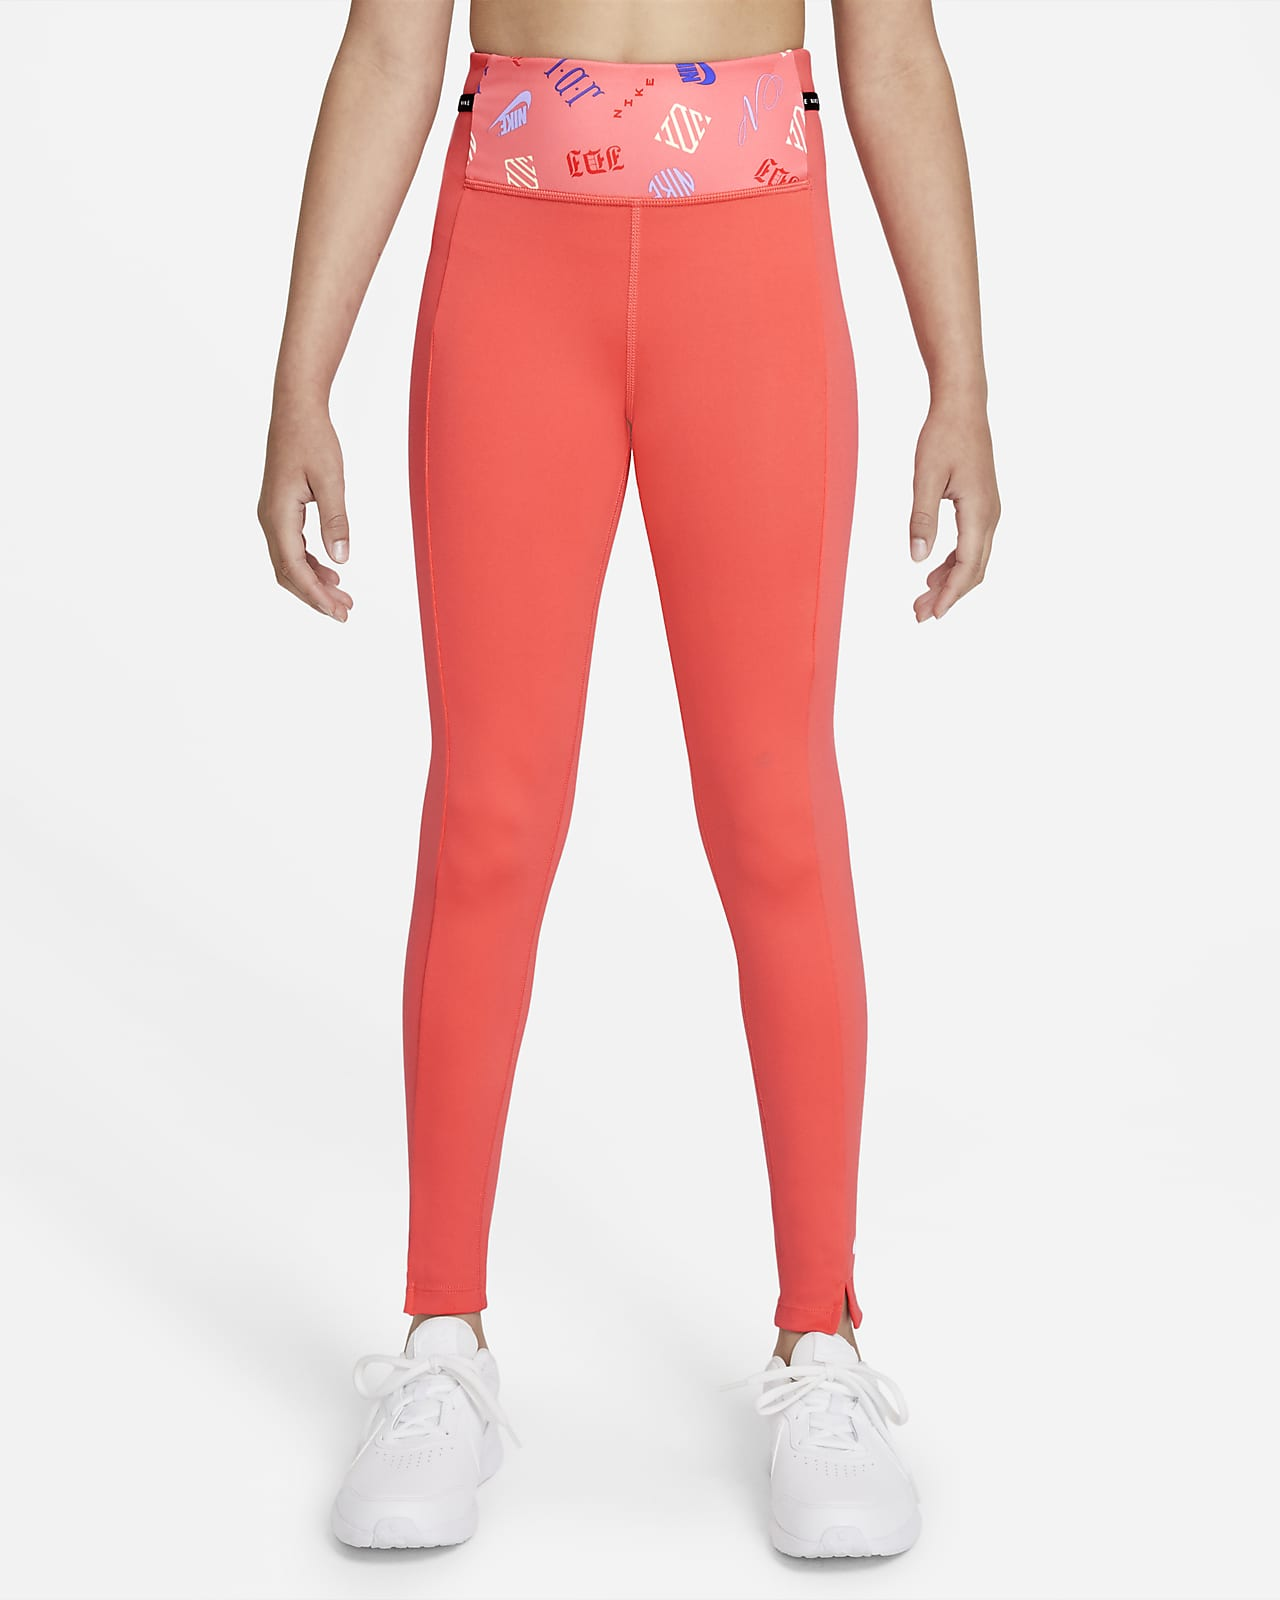 Nike Dri-FIT One Luxe 大童 (女童) 印製圖樣內搭褲